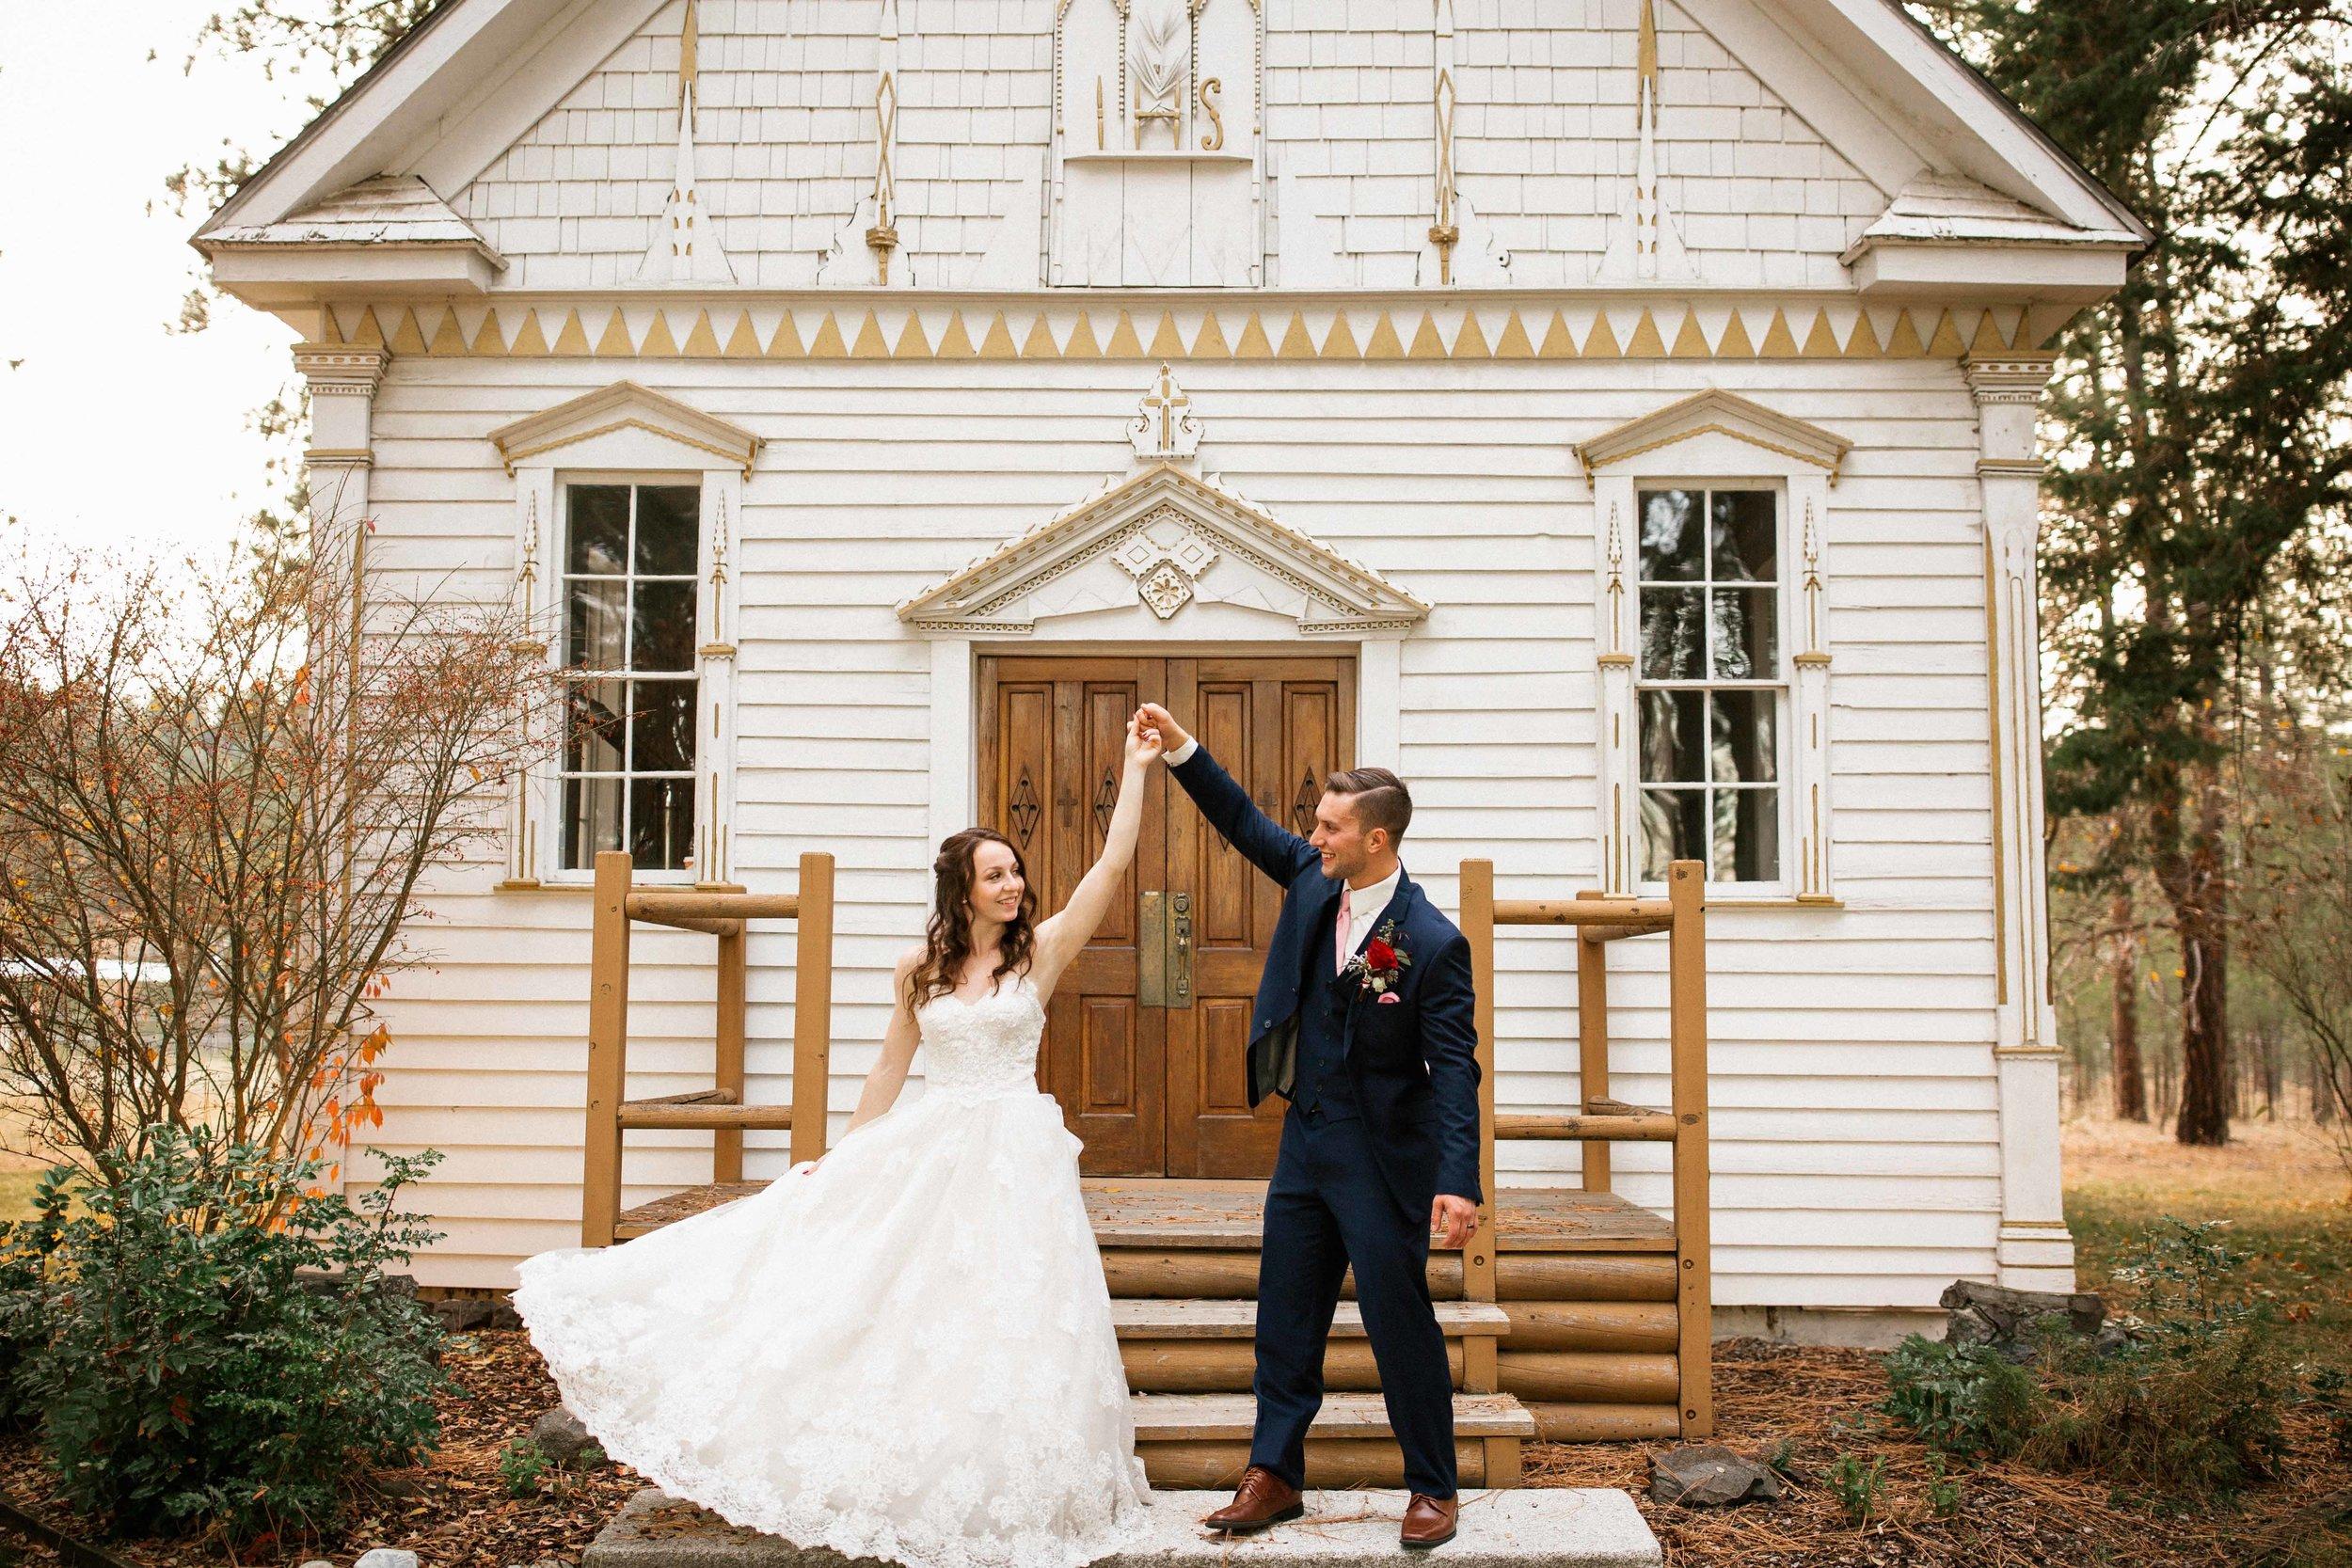 seattle-wedding-photos-2.jpg